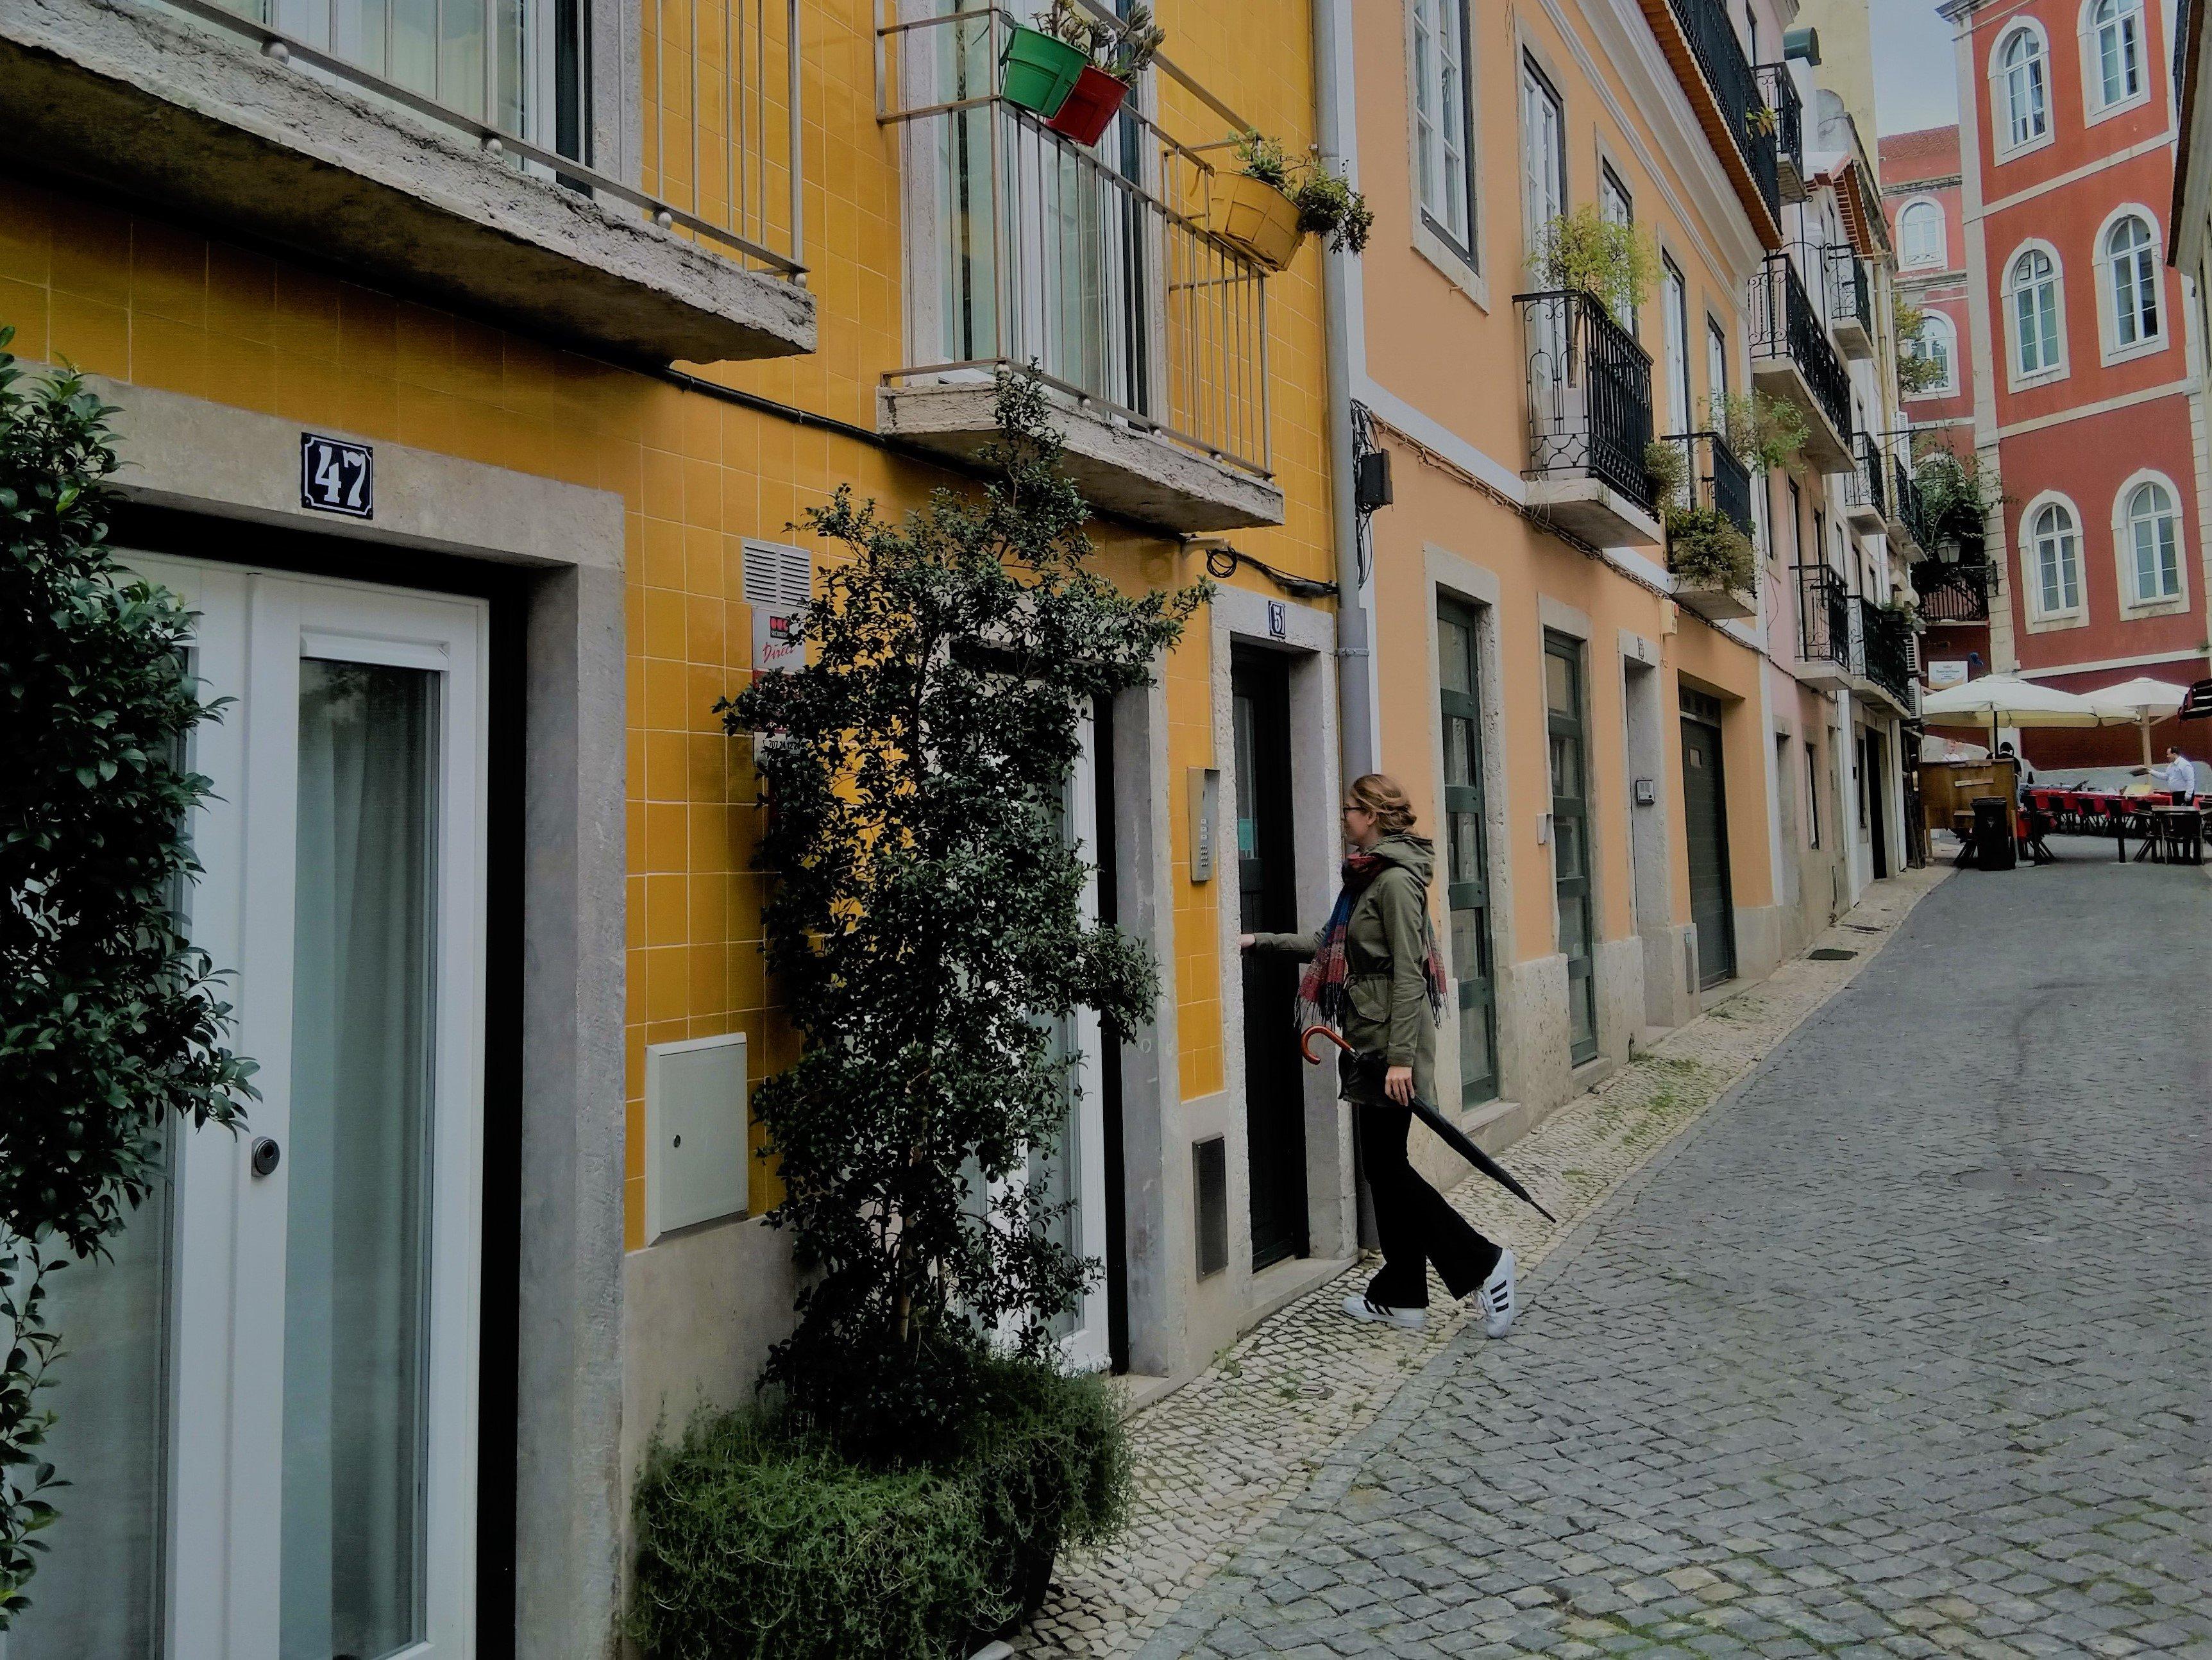 Een lagere risico opslag LTV hypotheekrente